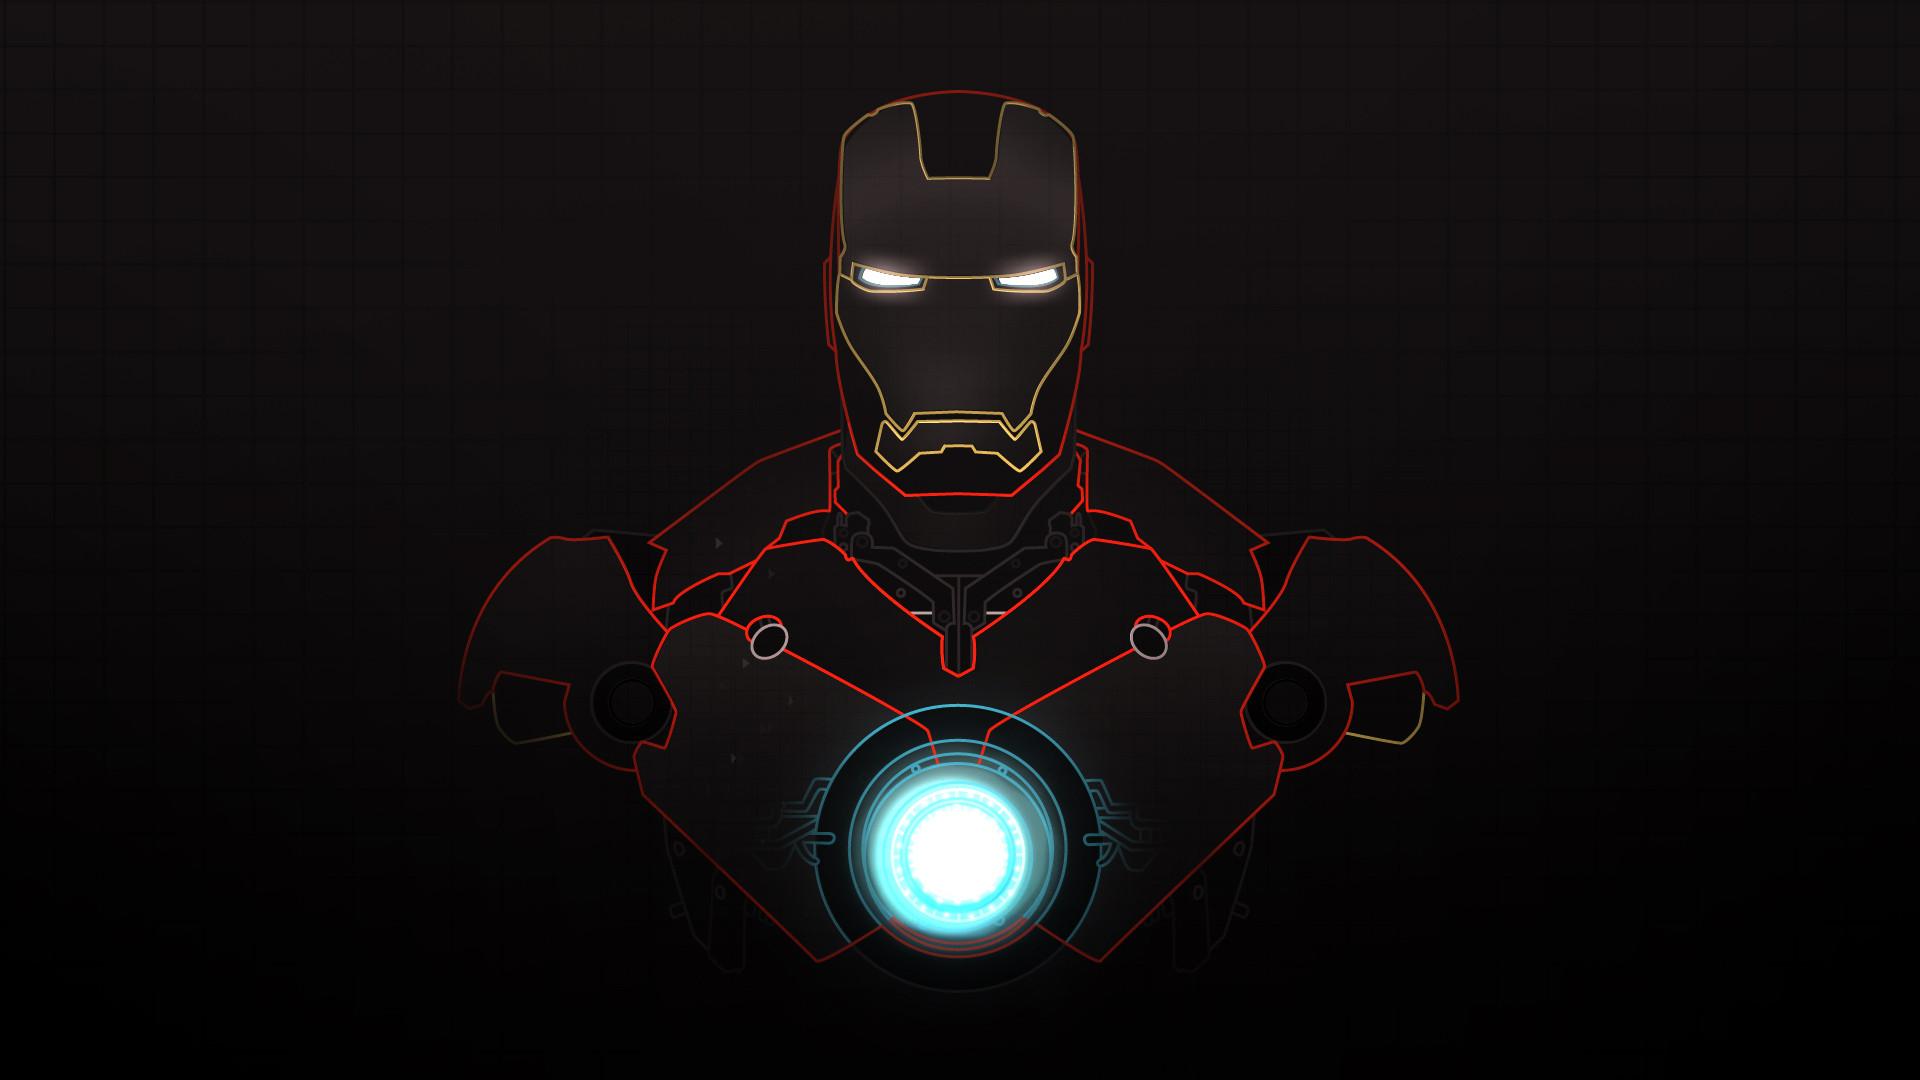 Cool Iron Man wallpaper 1920x1080 28350 1920x1080